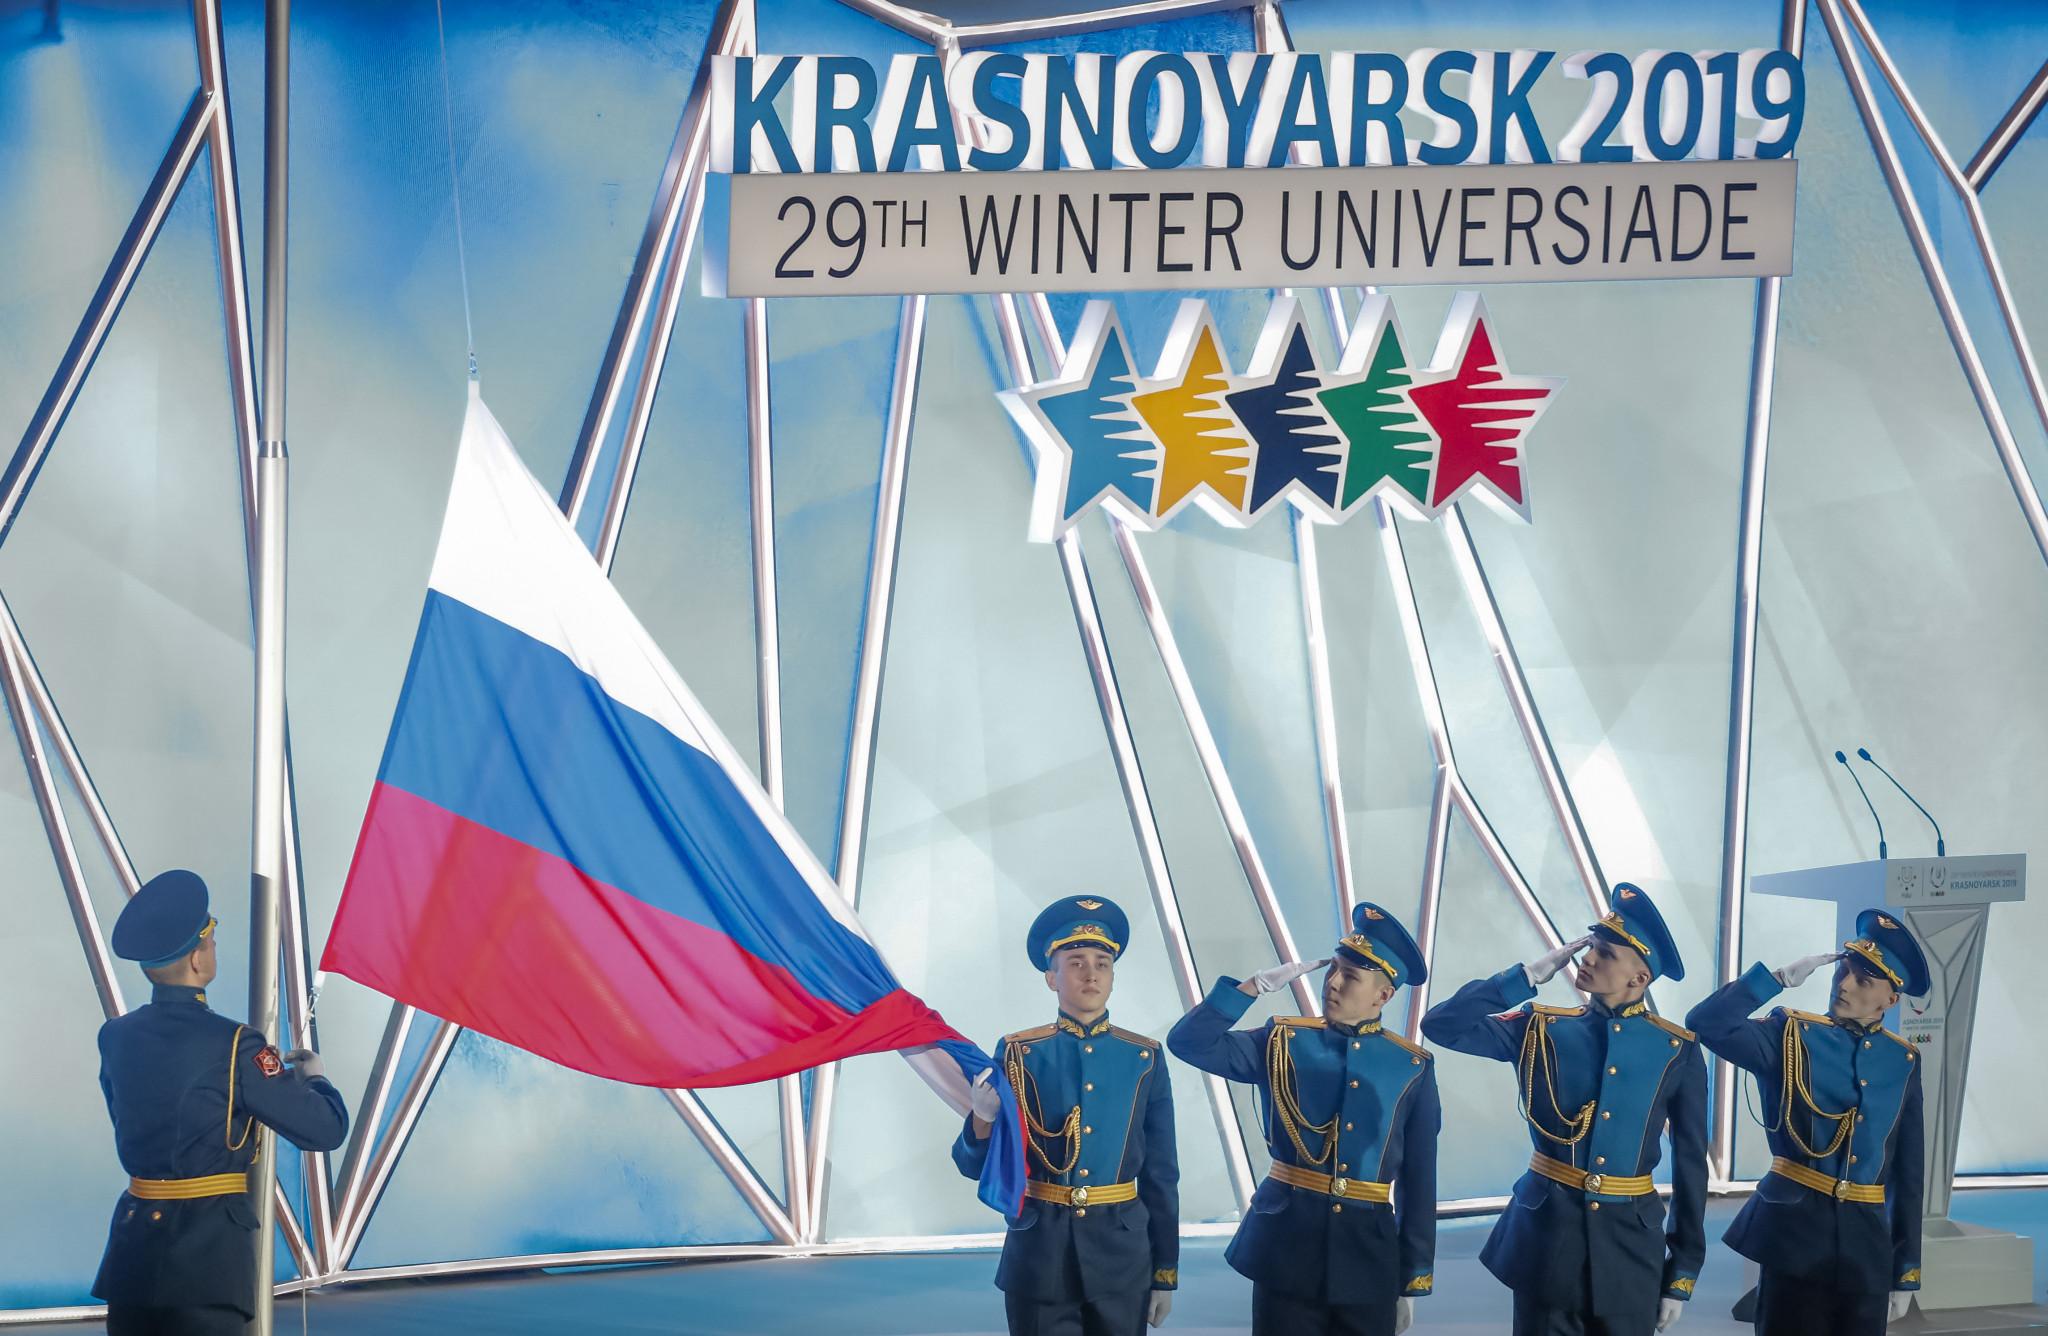 The last Winter Universiade was held in Krasnoyarsk in Russia in 2019 ©Getty Images